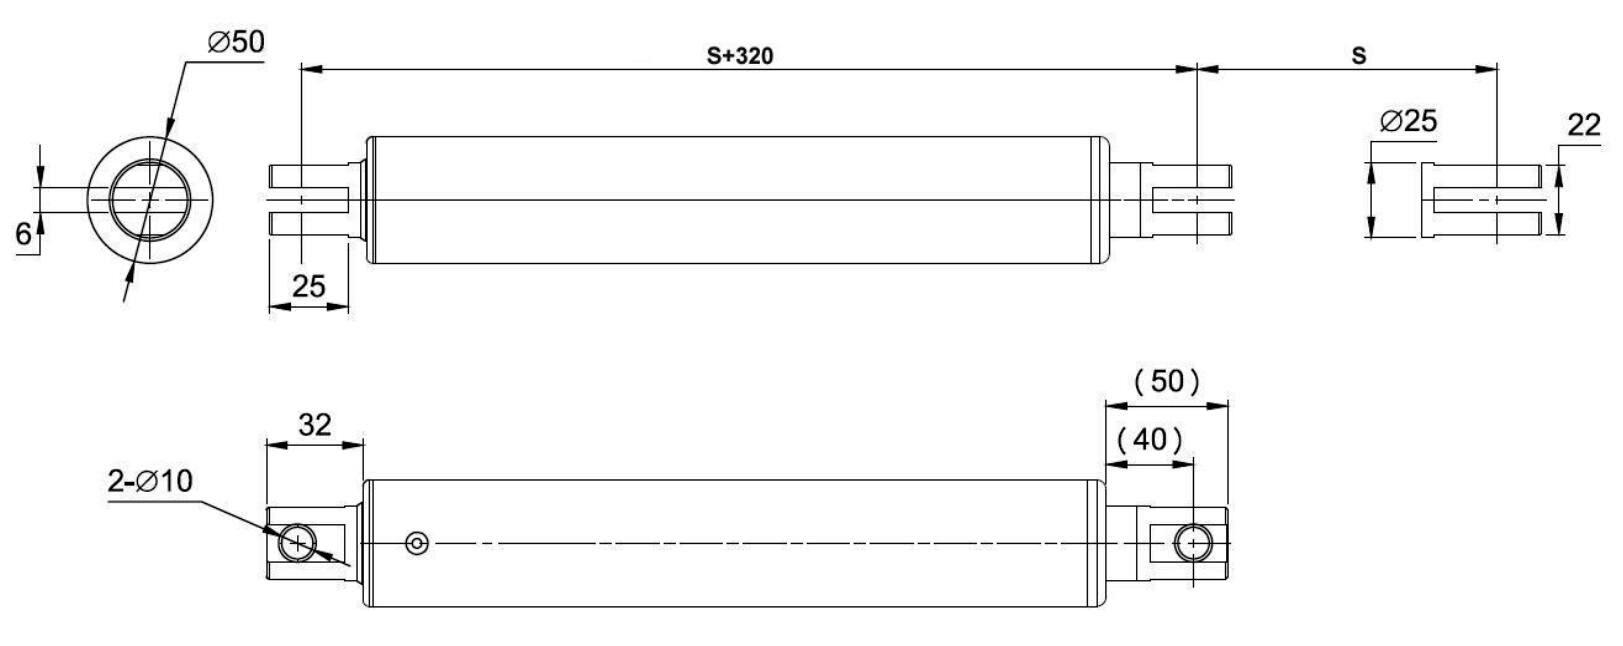 kc50-tubular-linear-actuator-5.jpg